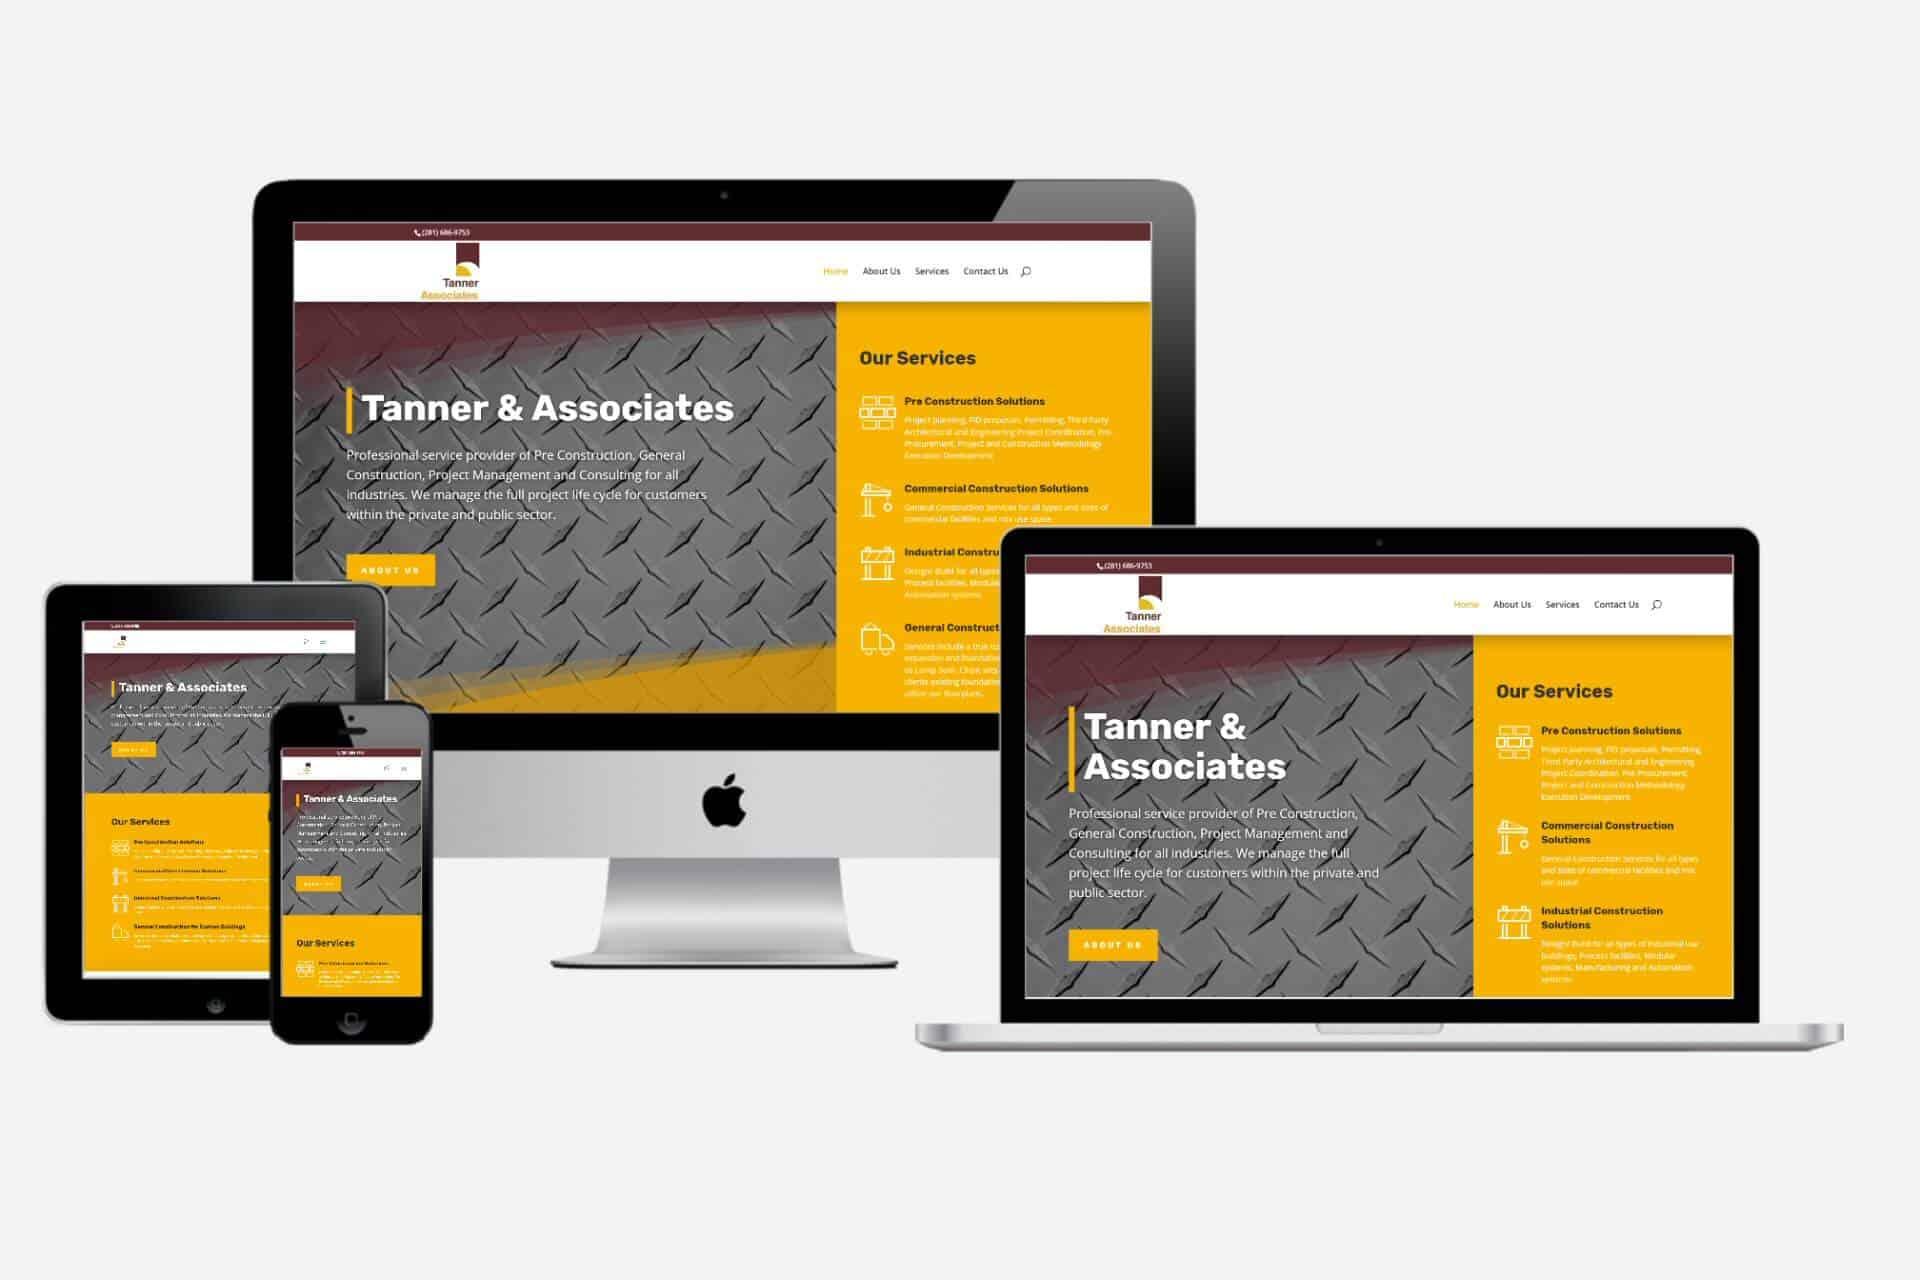 Tanner & Associates Website Design by WizardsWebs Design LLC